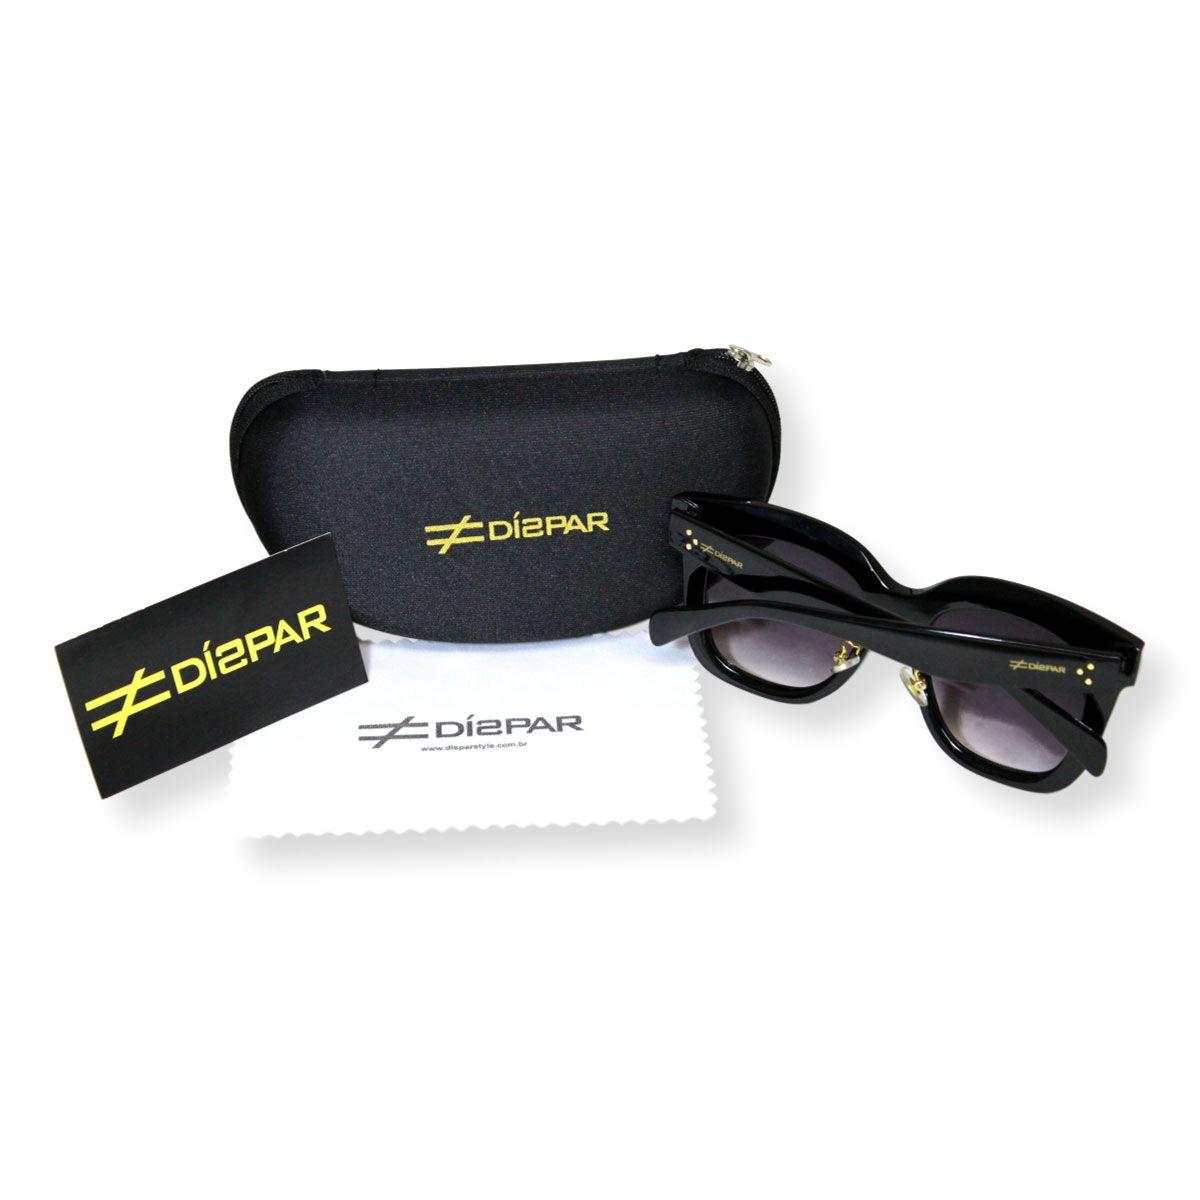 58a4071e0 ... Venda Atacado - 100 Kits de Óculos Personalizados ...